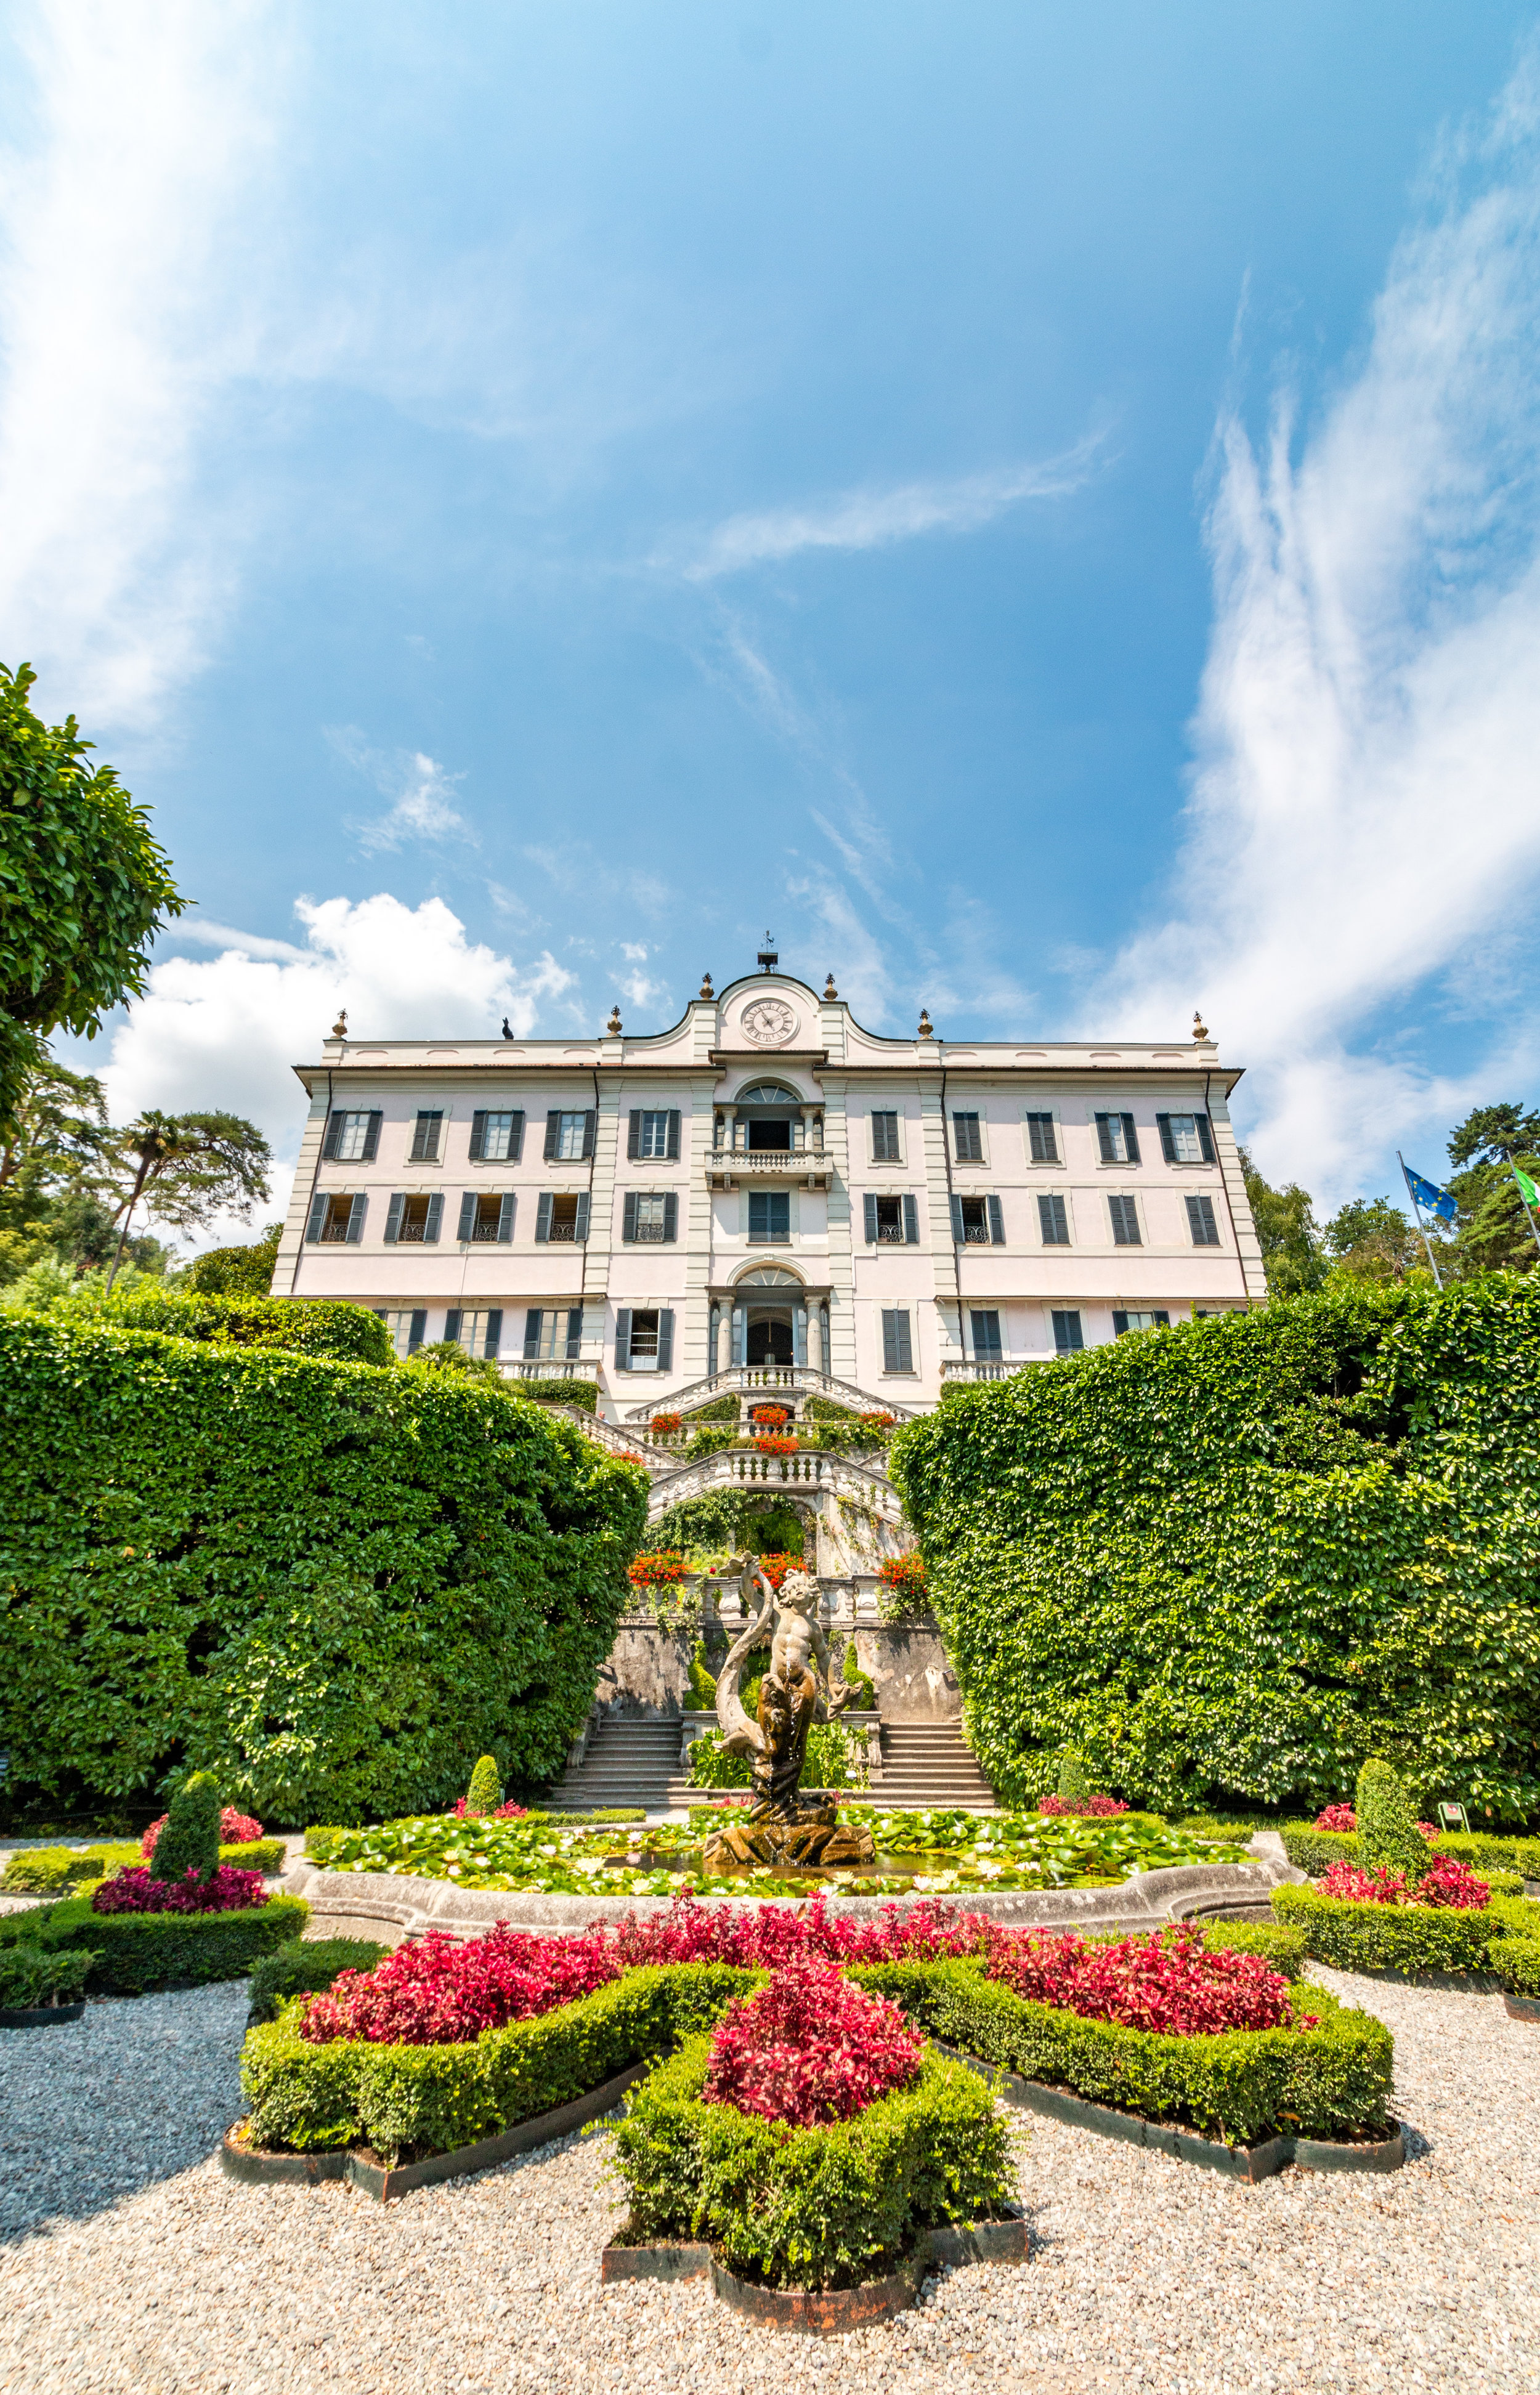 Entrence of the Villa Carlotta